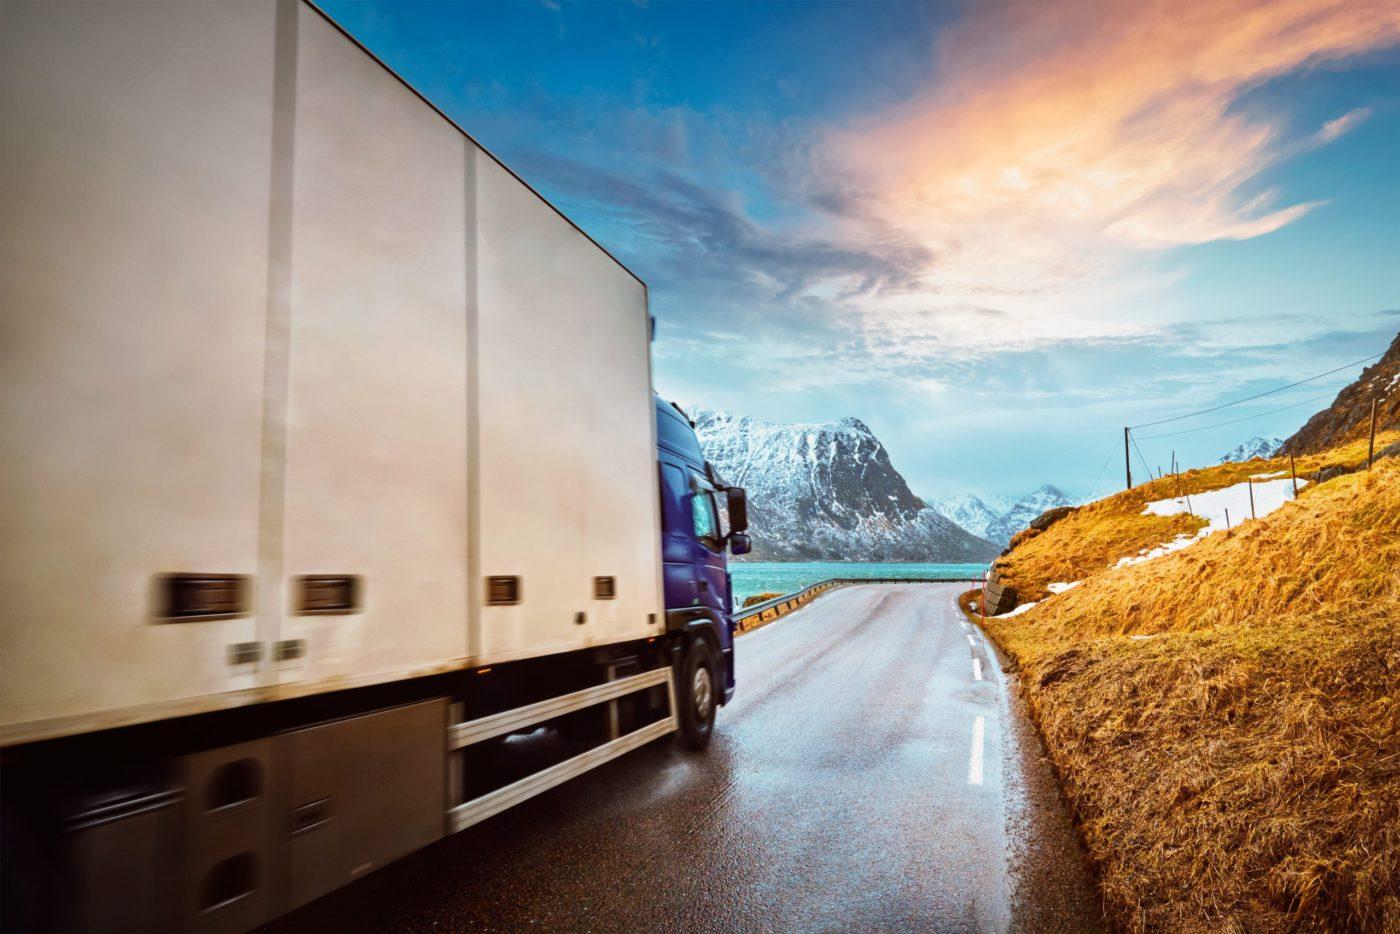 Truck on road in Norwegian fjord on sunset. Lofoten islands, Norway. Motion blur